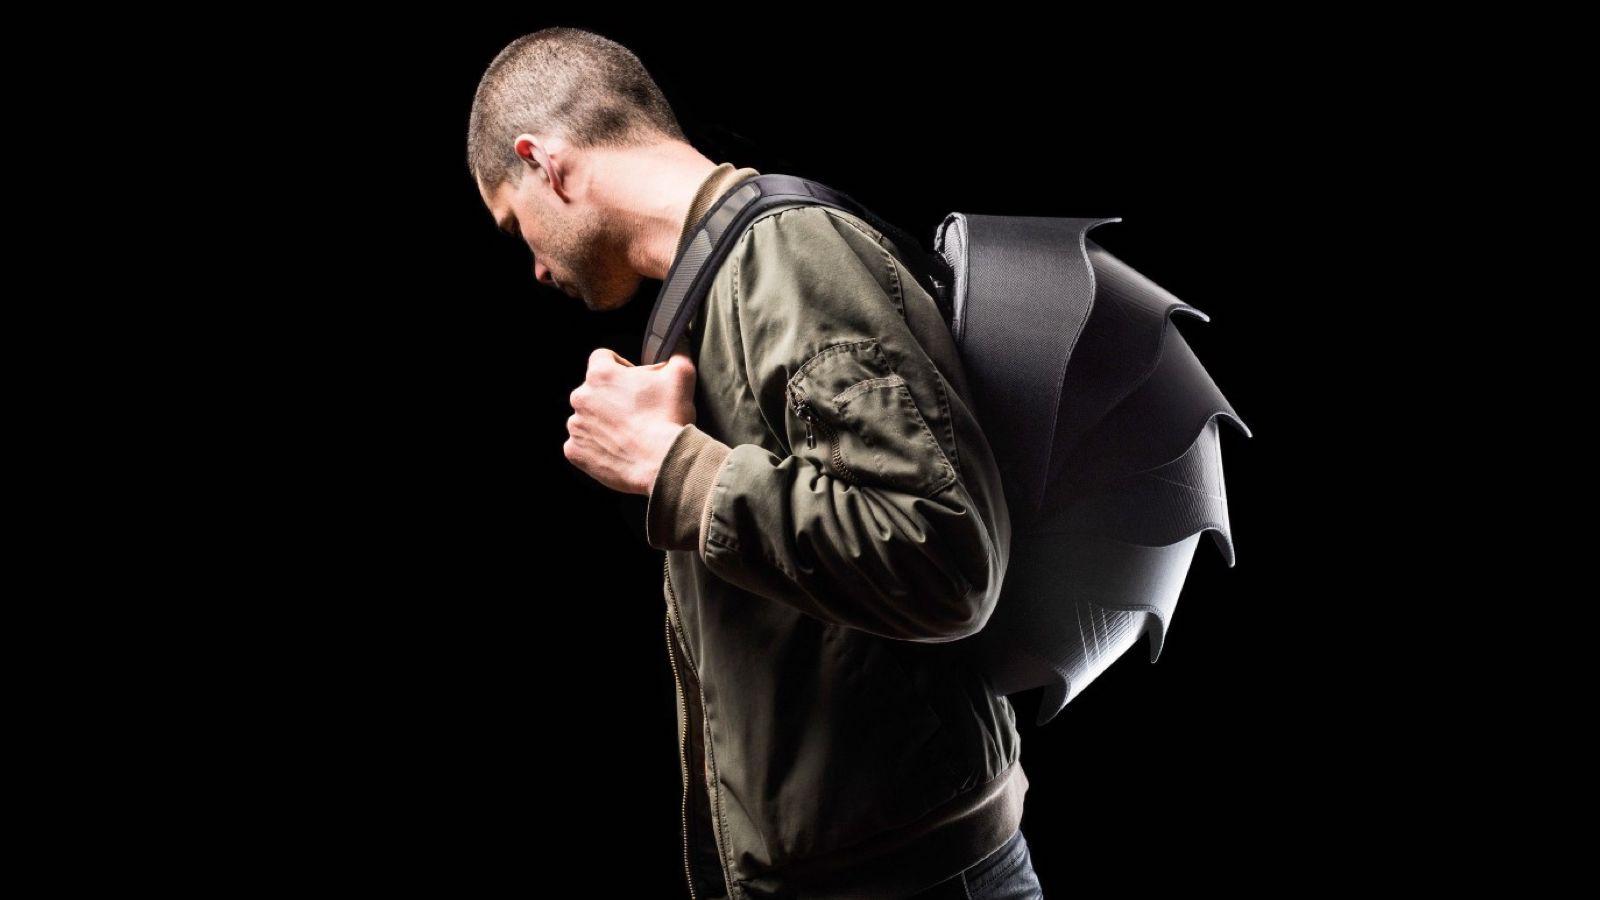 PANGOLIN Series concept backpack has a hemispherical shape